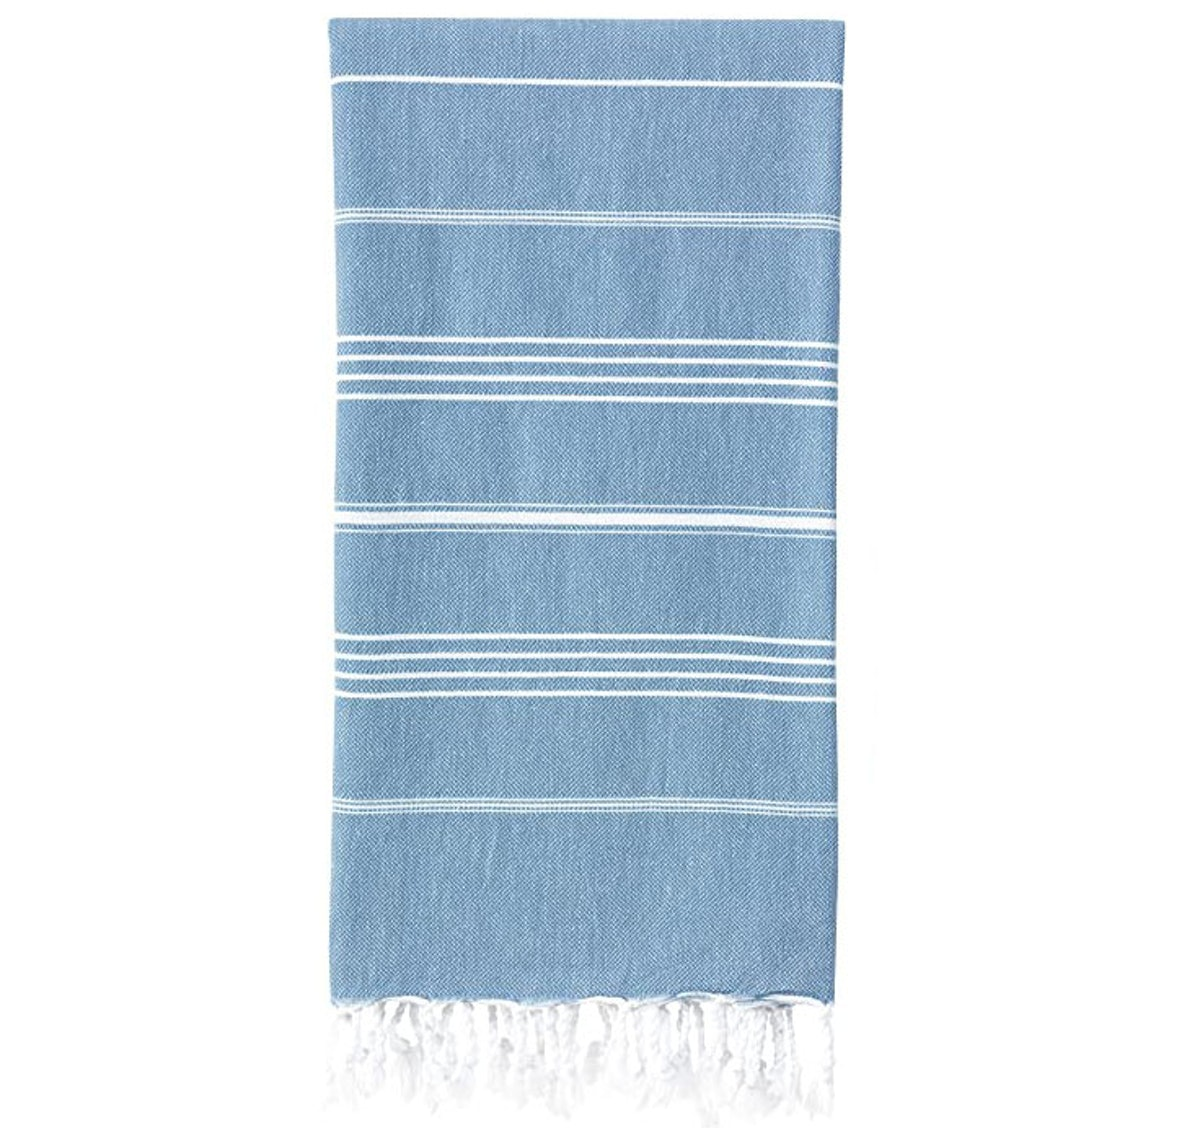 WETCAT Turkish Beach Towel (38 x 71)